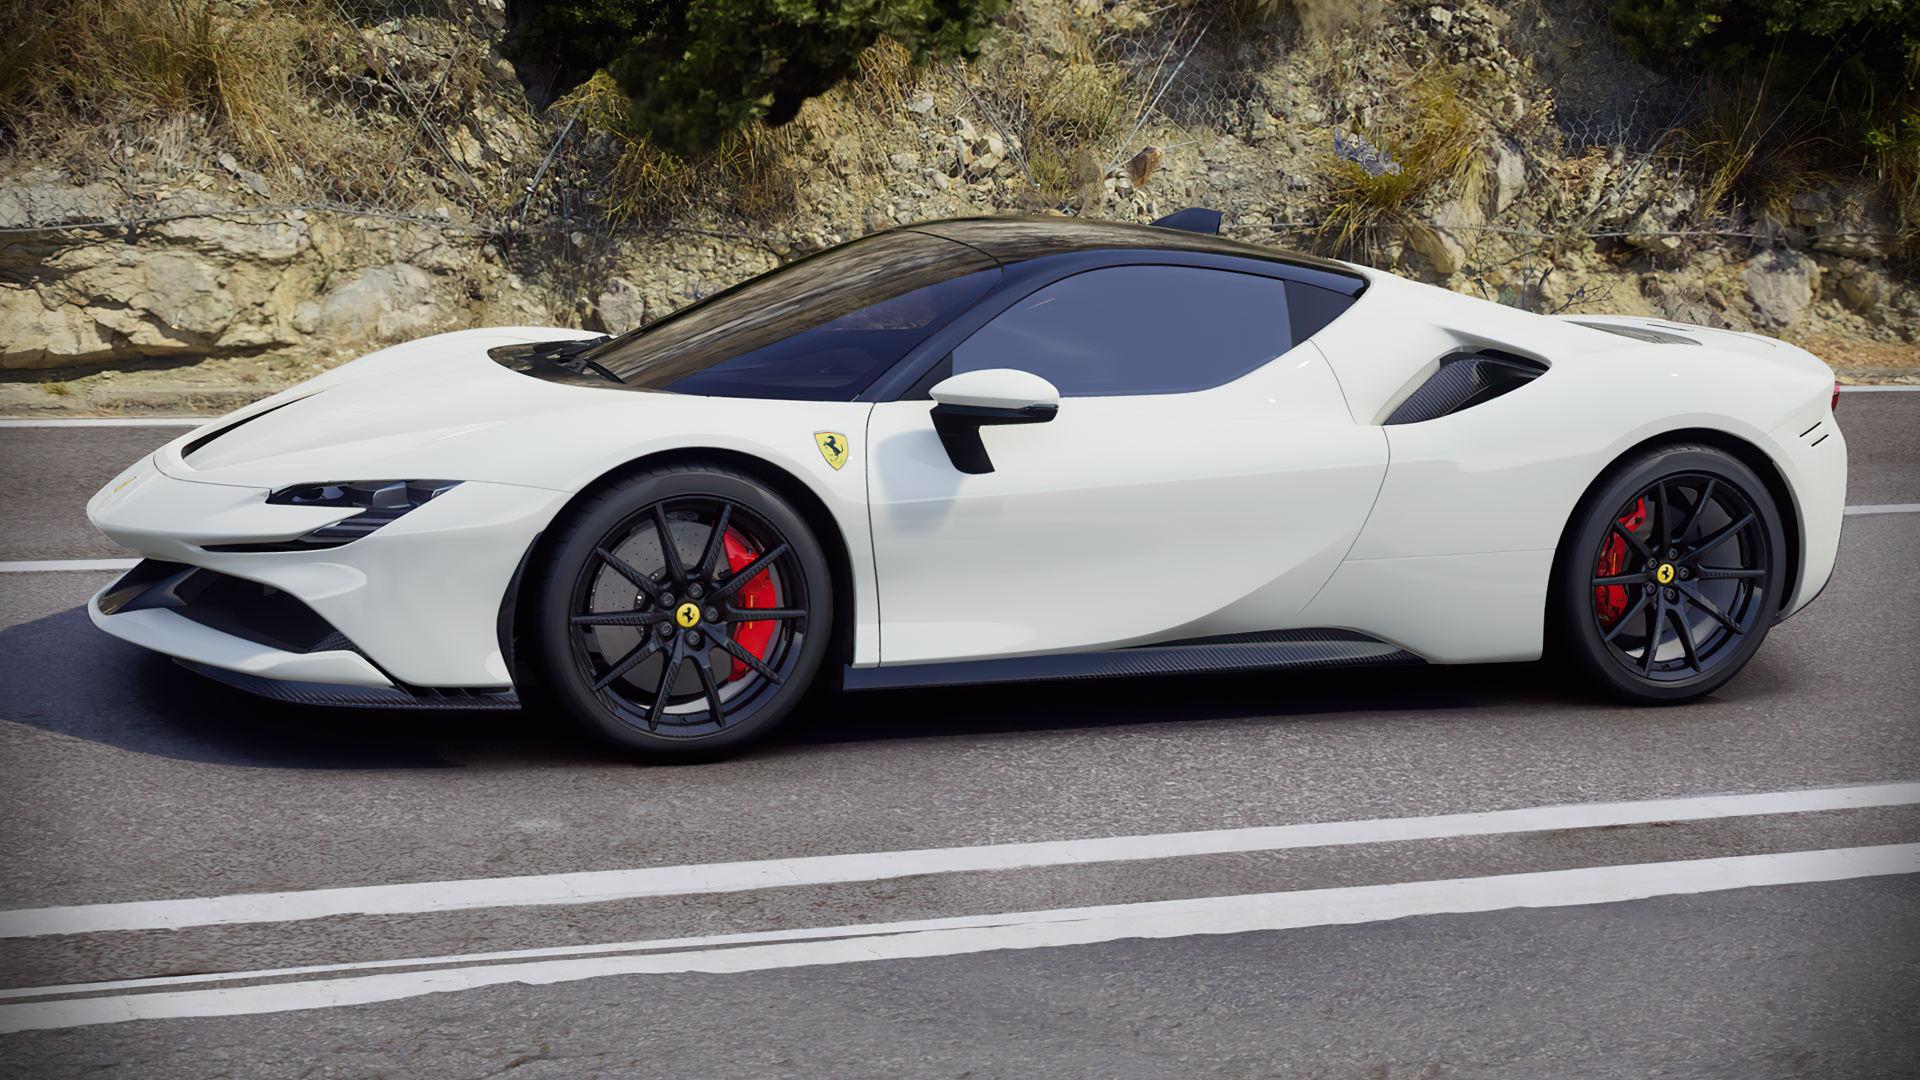 2020 Ferrari Sf90 Stradale White